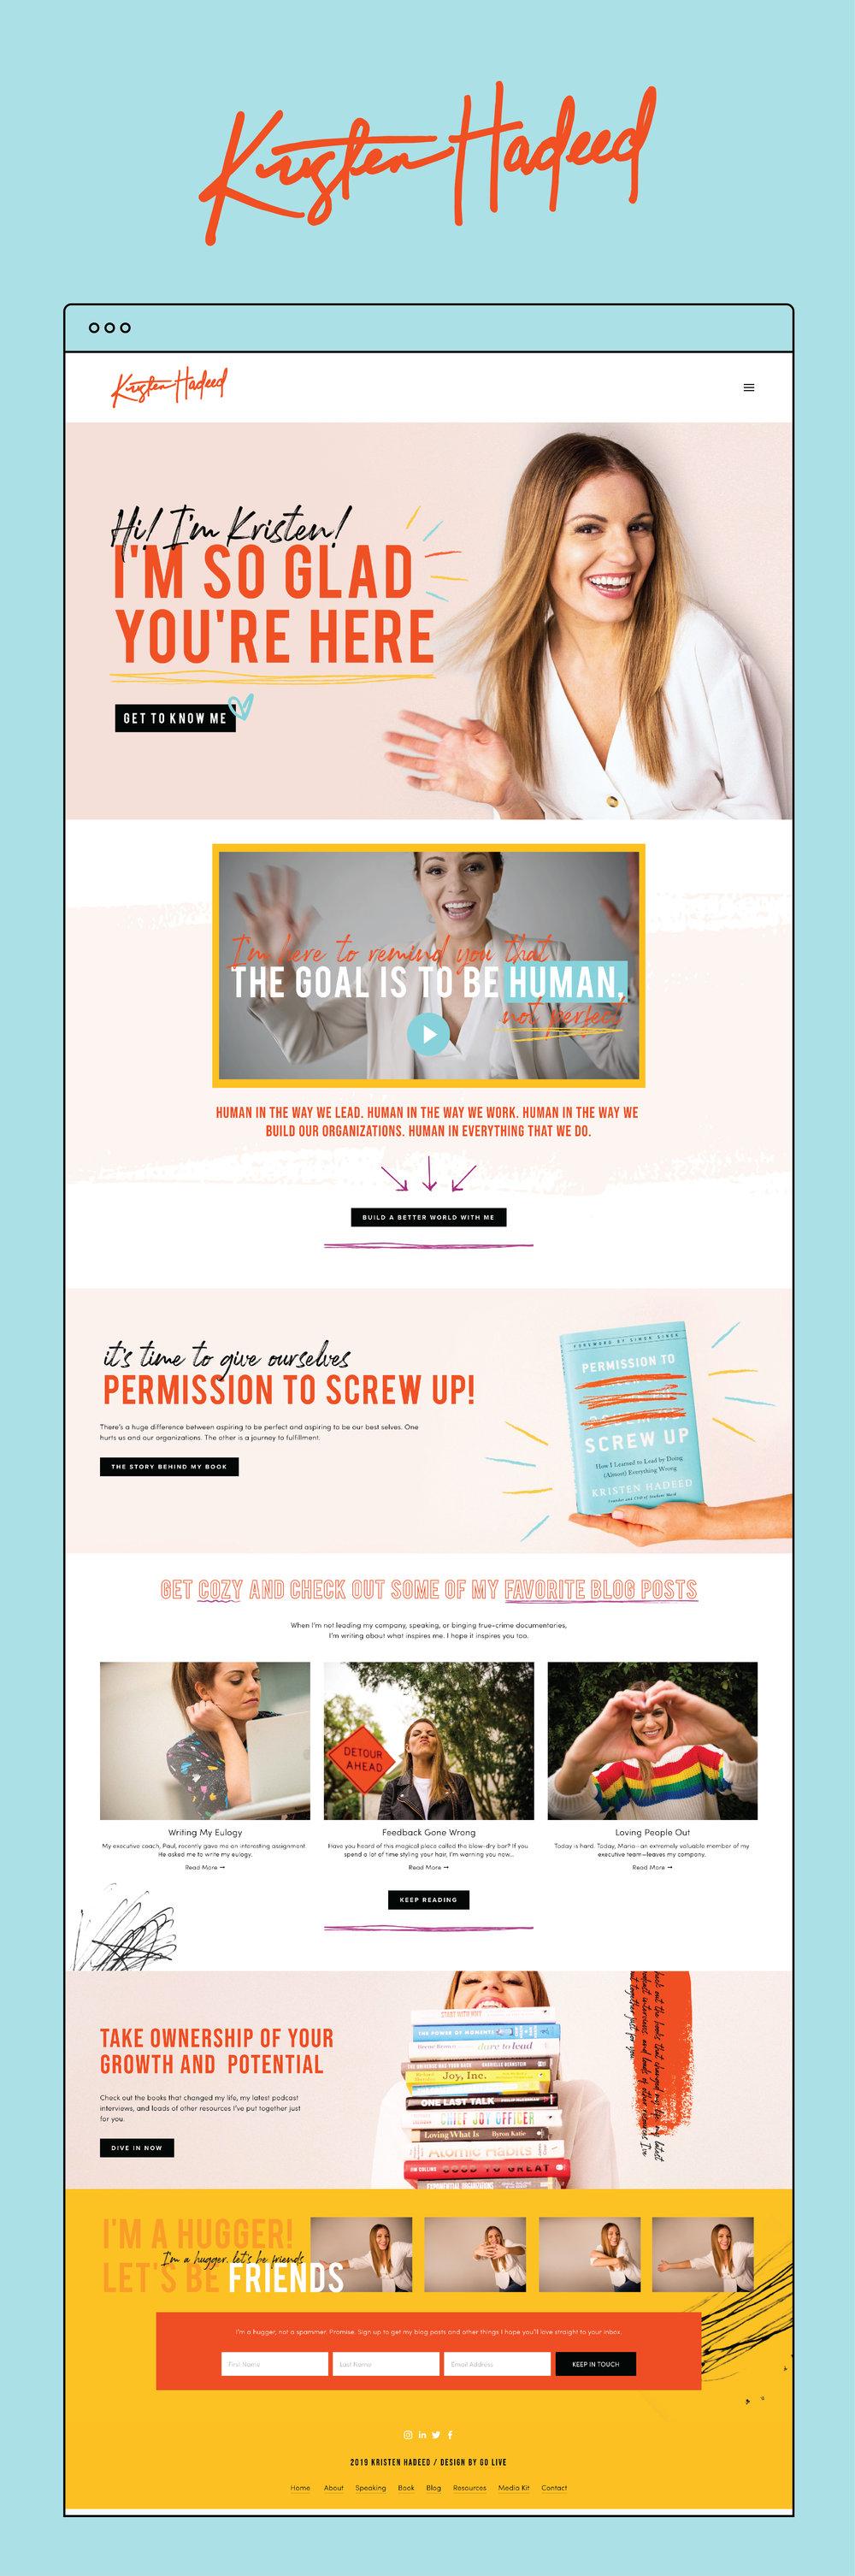 Bright,+Colorful+&+Unique+Custom+Squarespace+Website+Design+_+By+GoLive.jpg